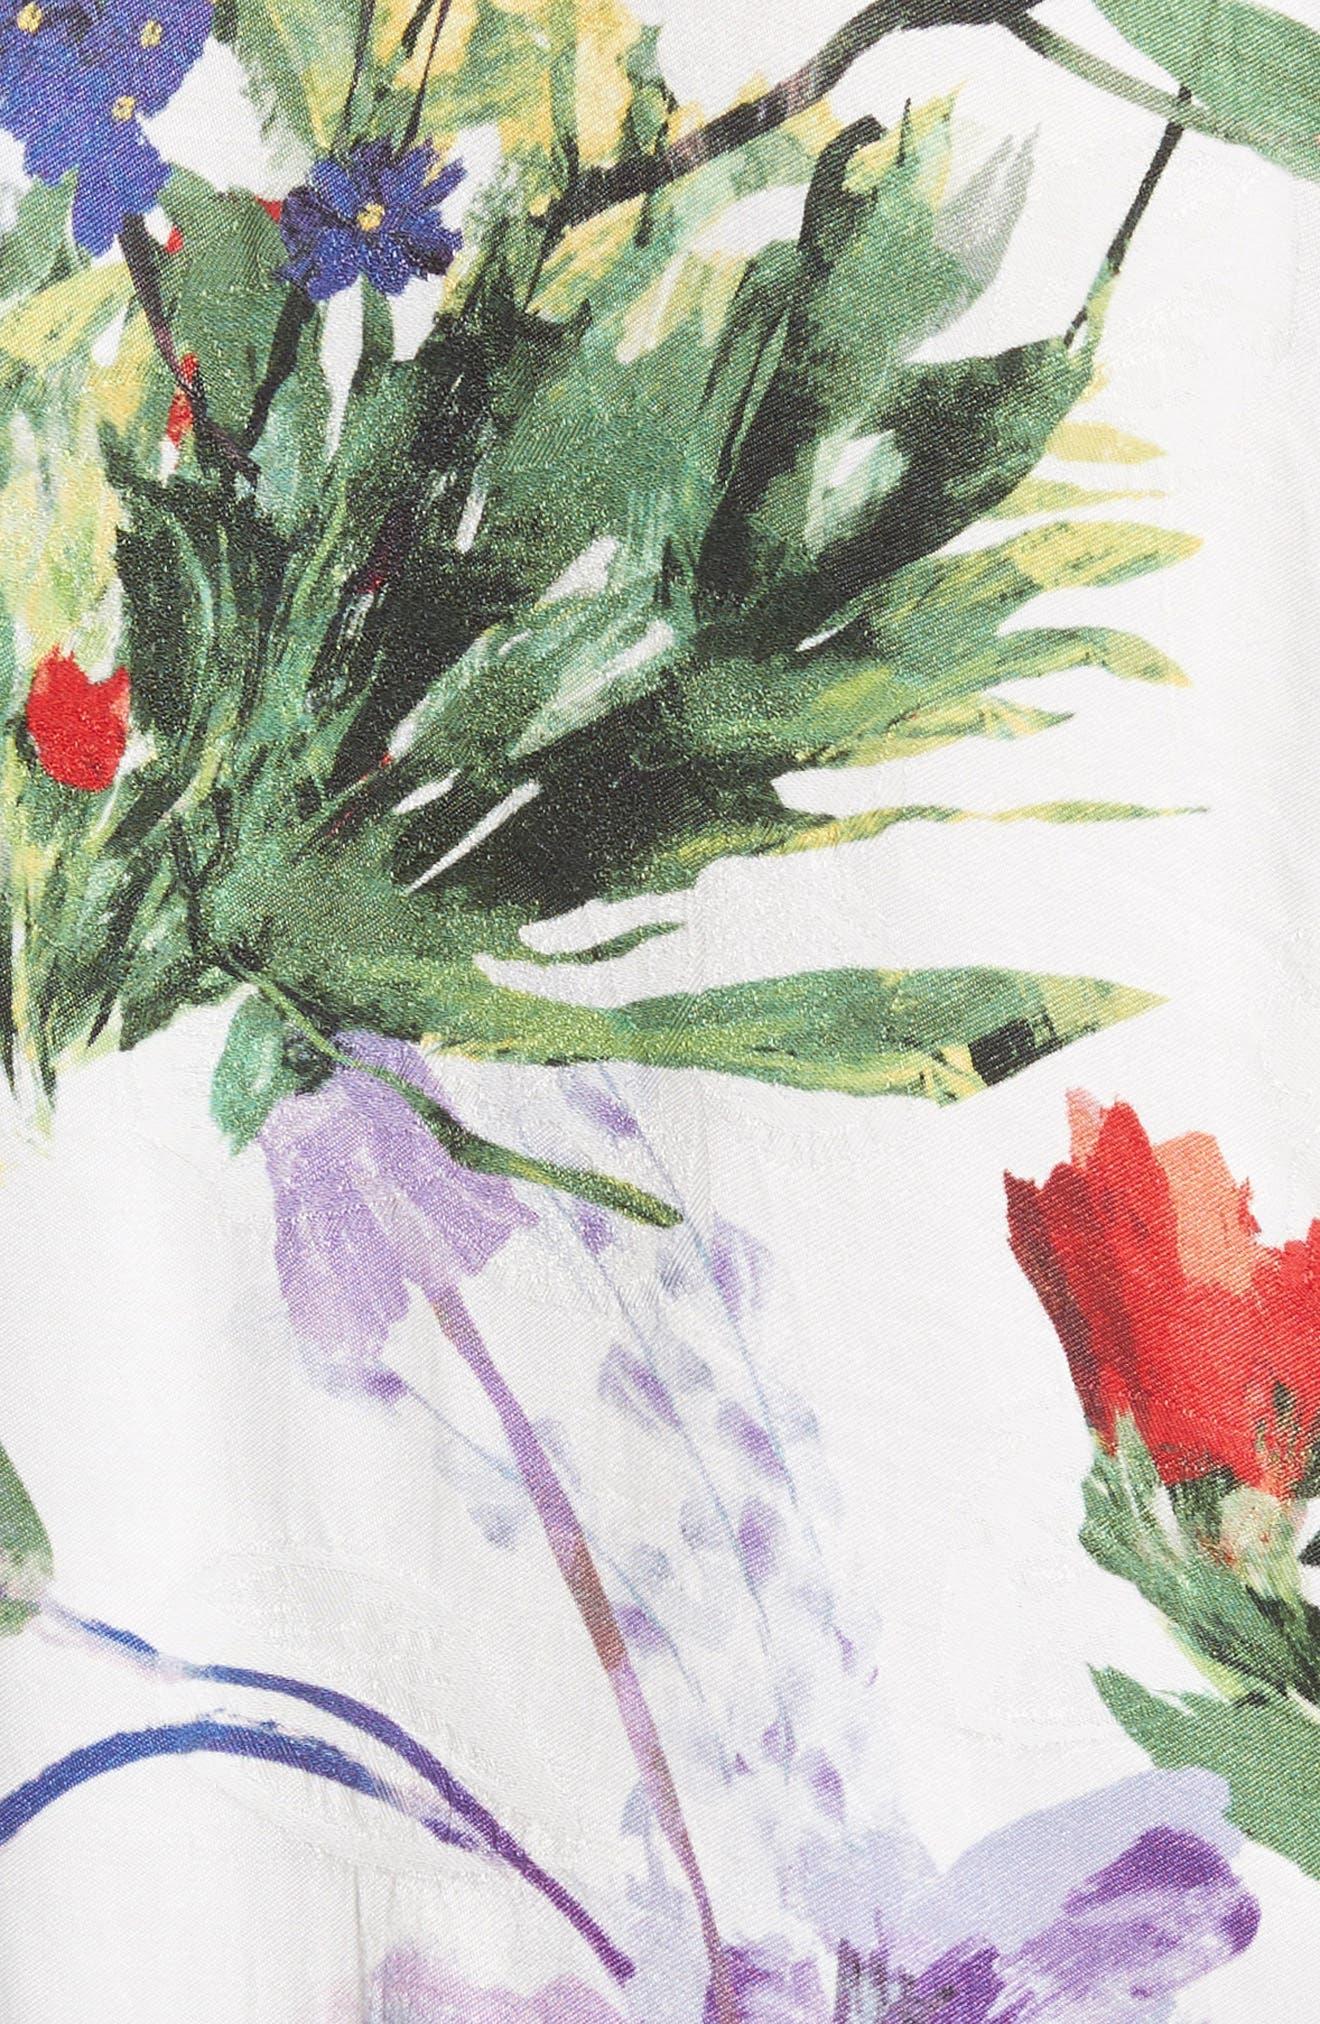 Hellen Boxy Floral Print Tee,                             Alternate thumbnail 5, color,                             Wildflower